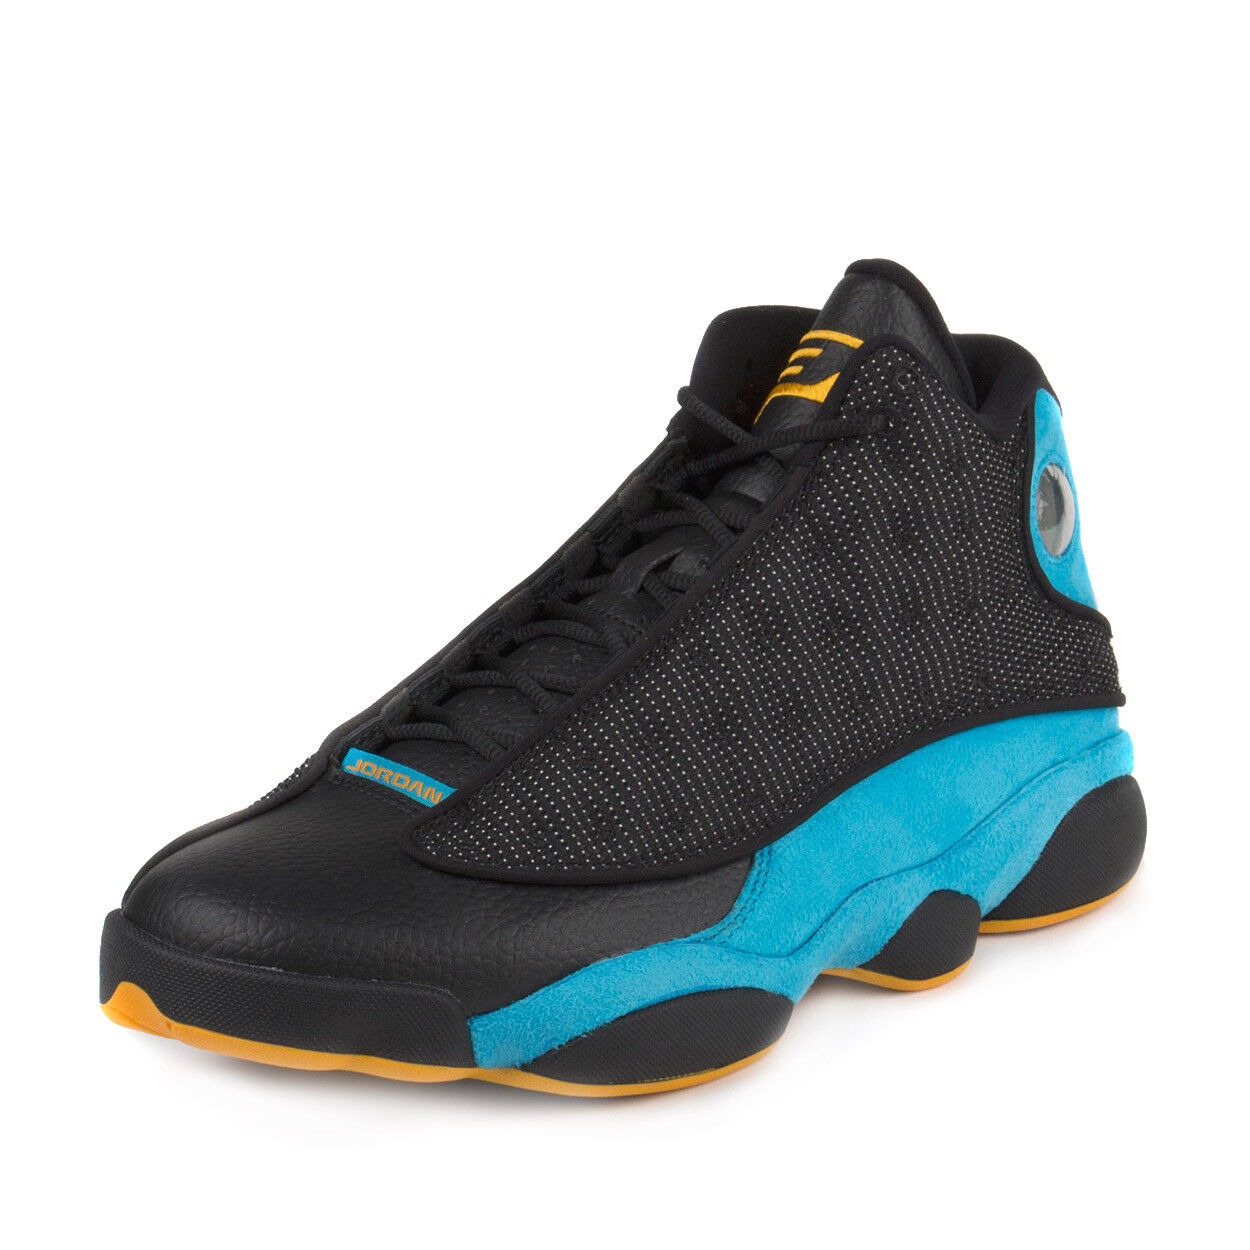 Nike Mens Air Jordan 13 Retro CP PE CP3 Black/Sunstone-Orion Blue 823902-015